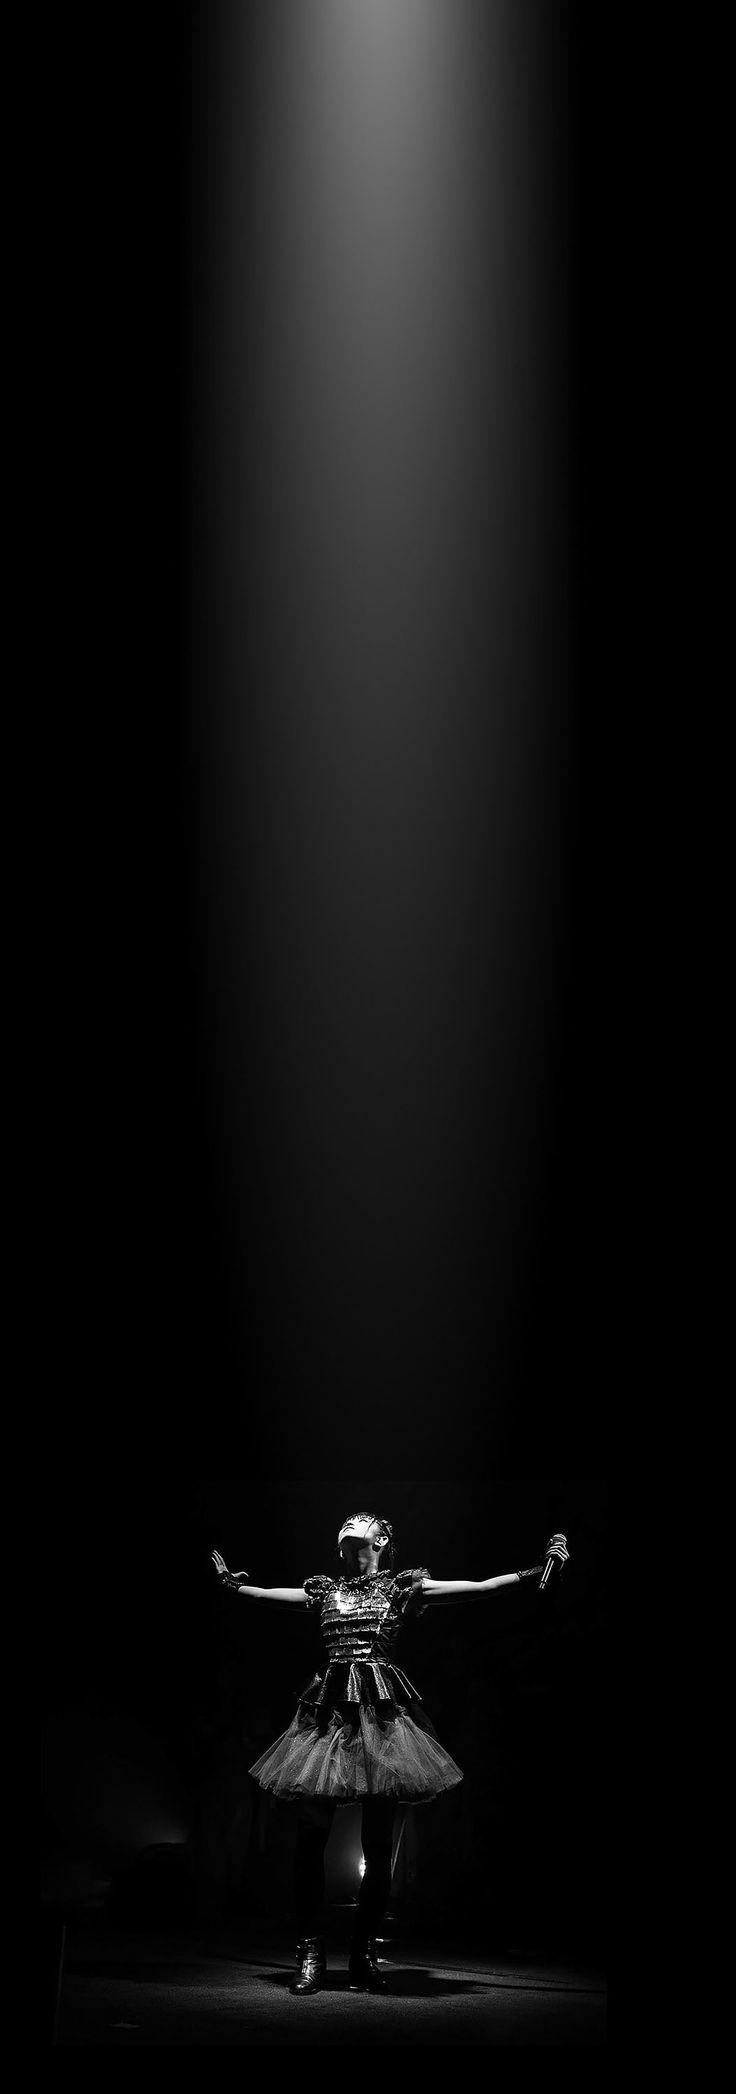 su-metal-1.jpg 1,054×3,000 ピクセル